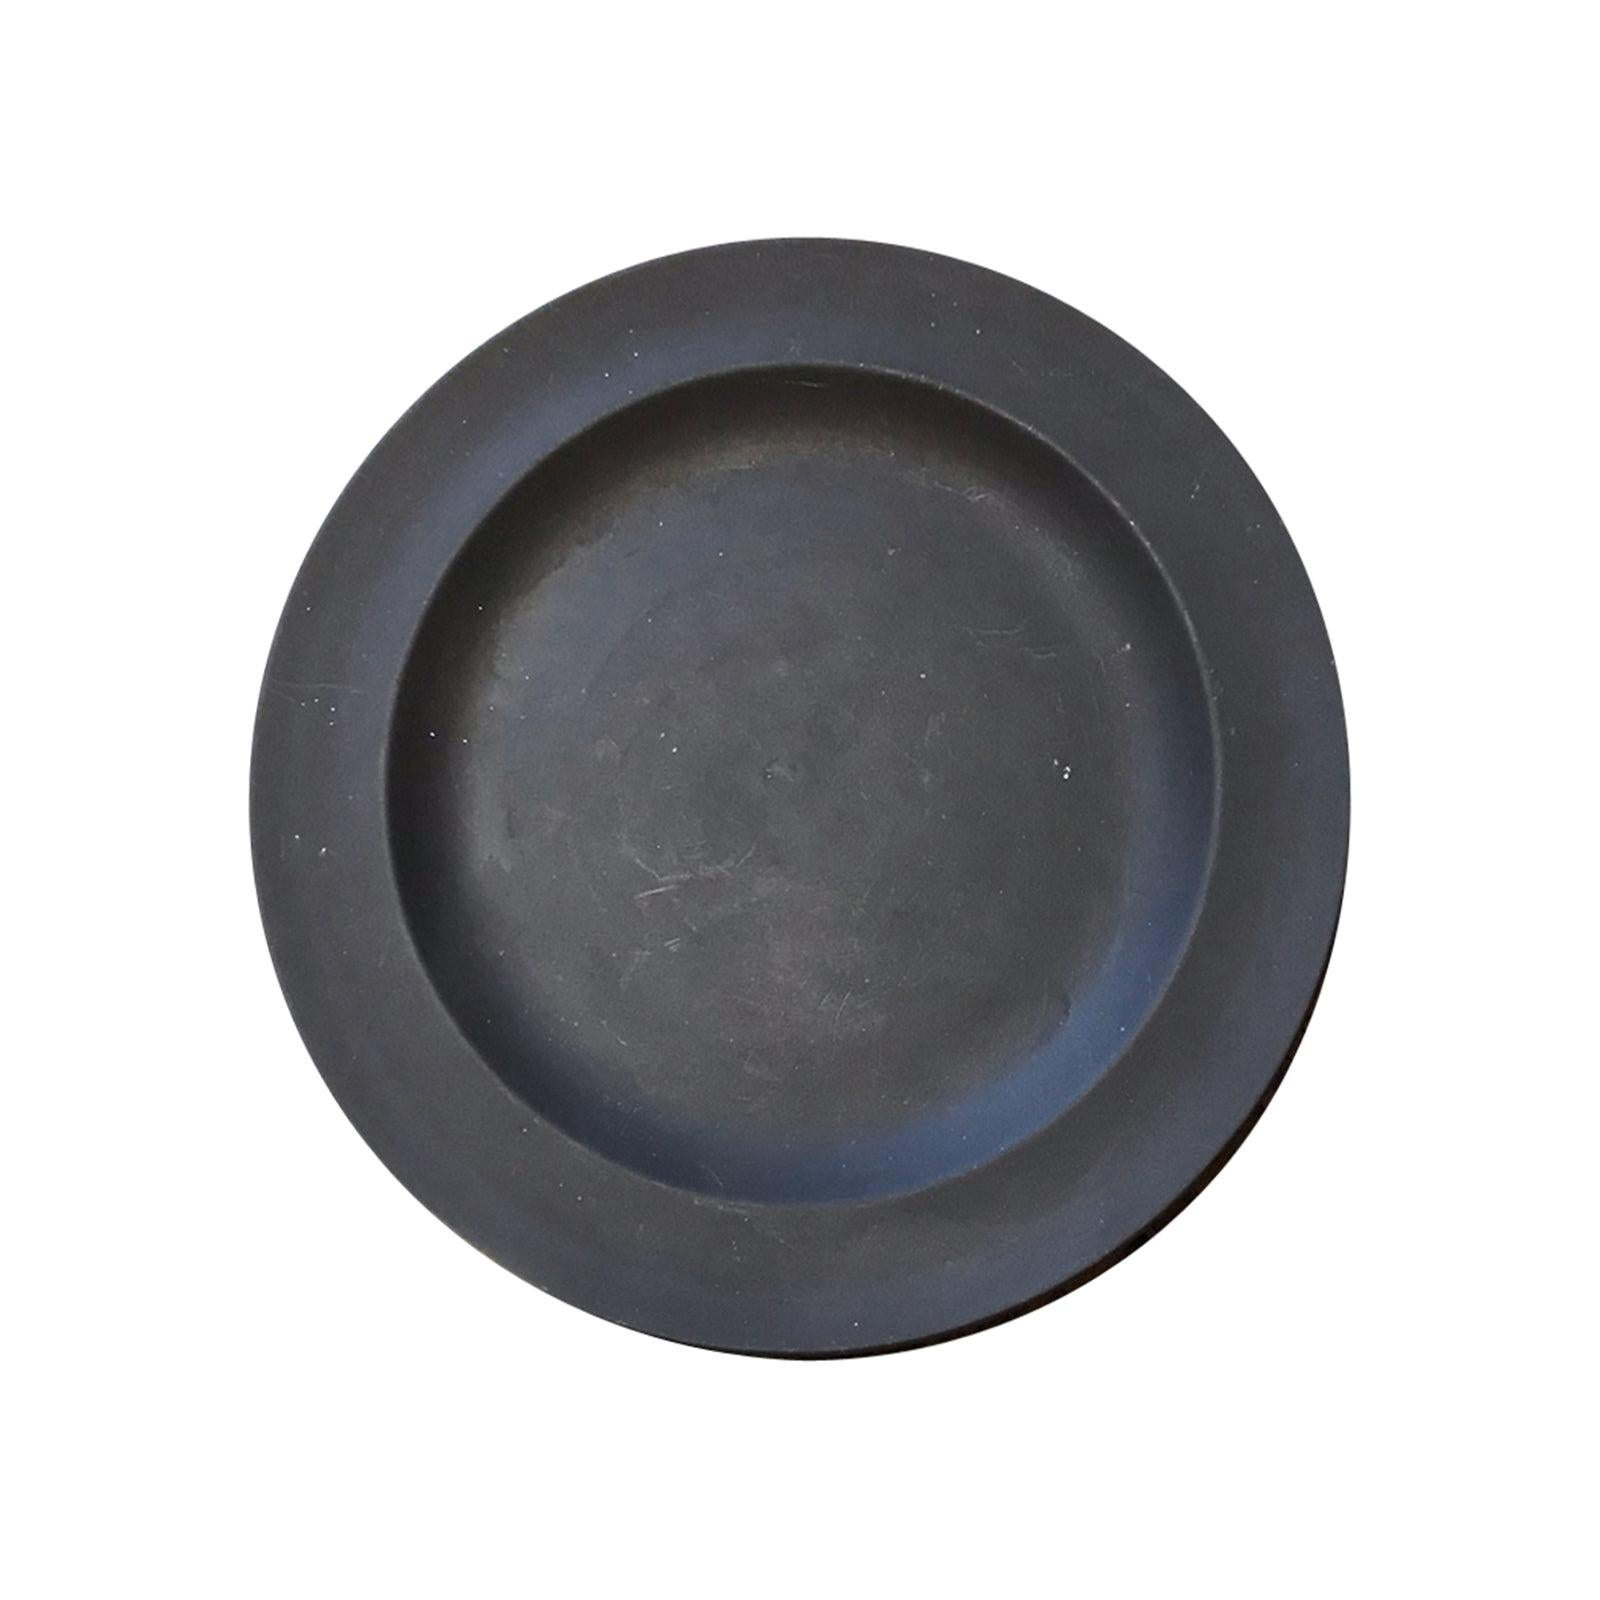 20th Century English Wedgwood Basalt Plate, Marked